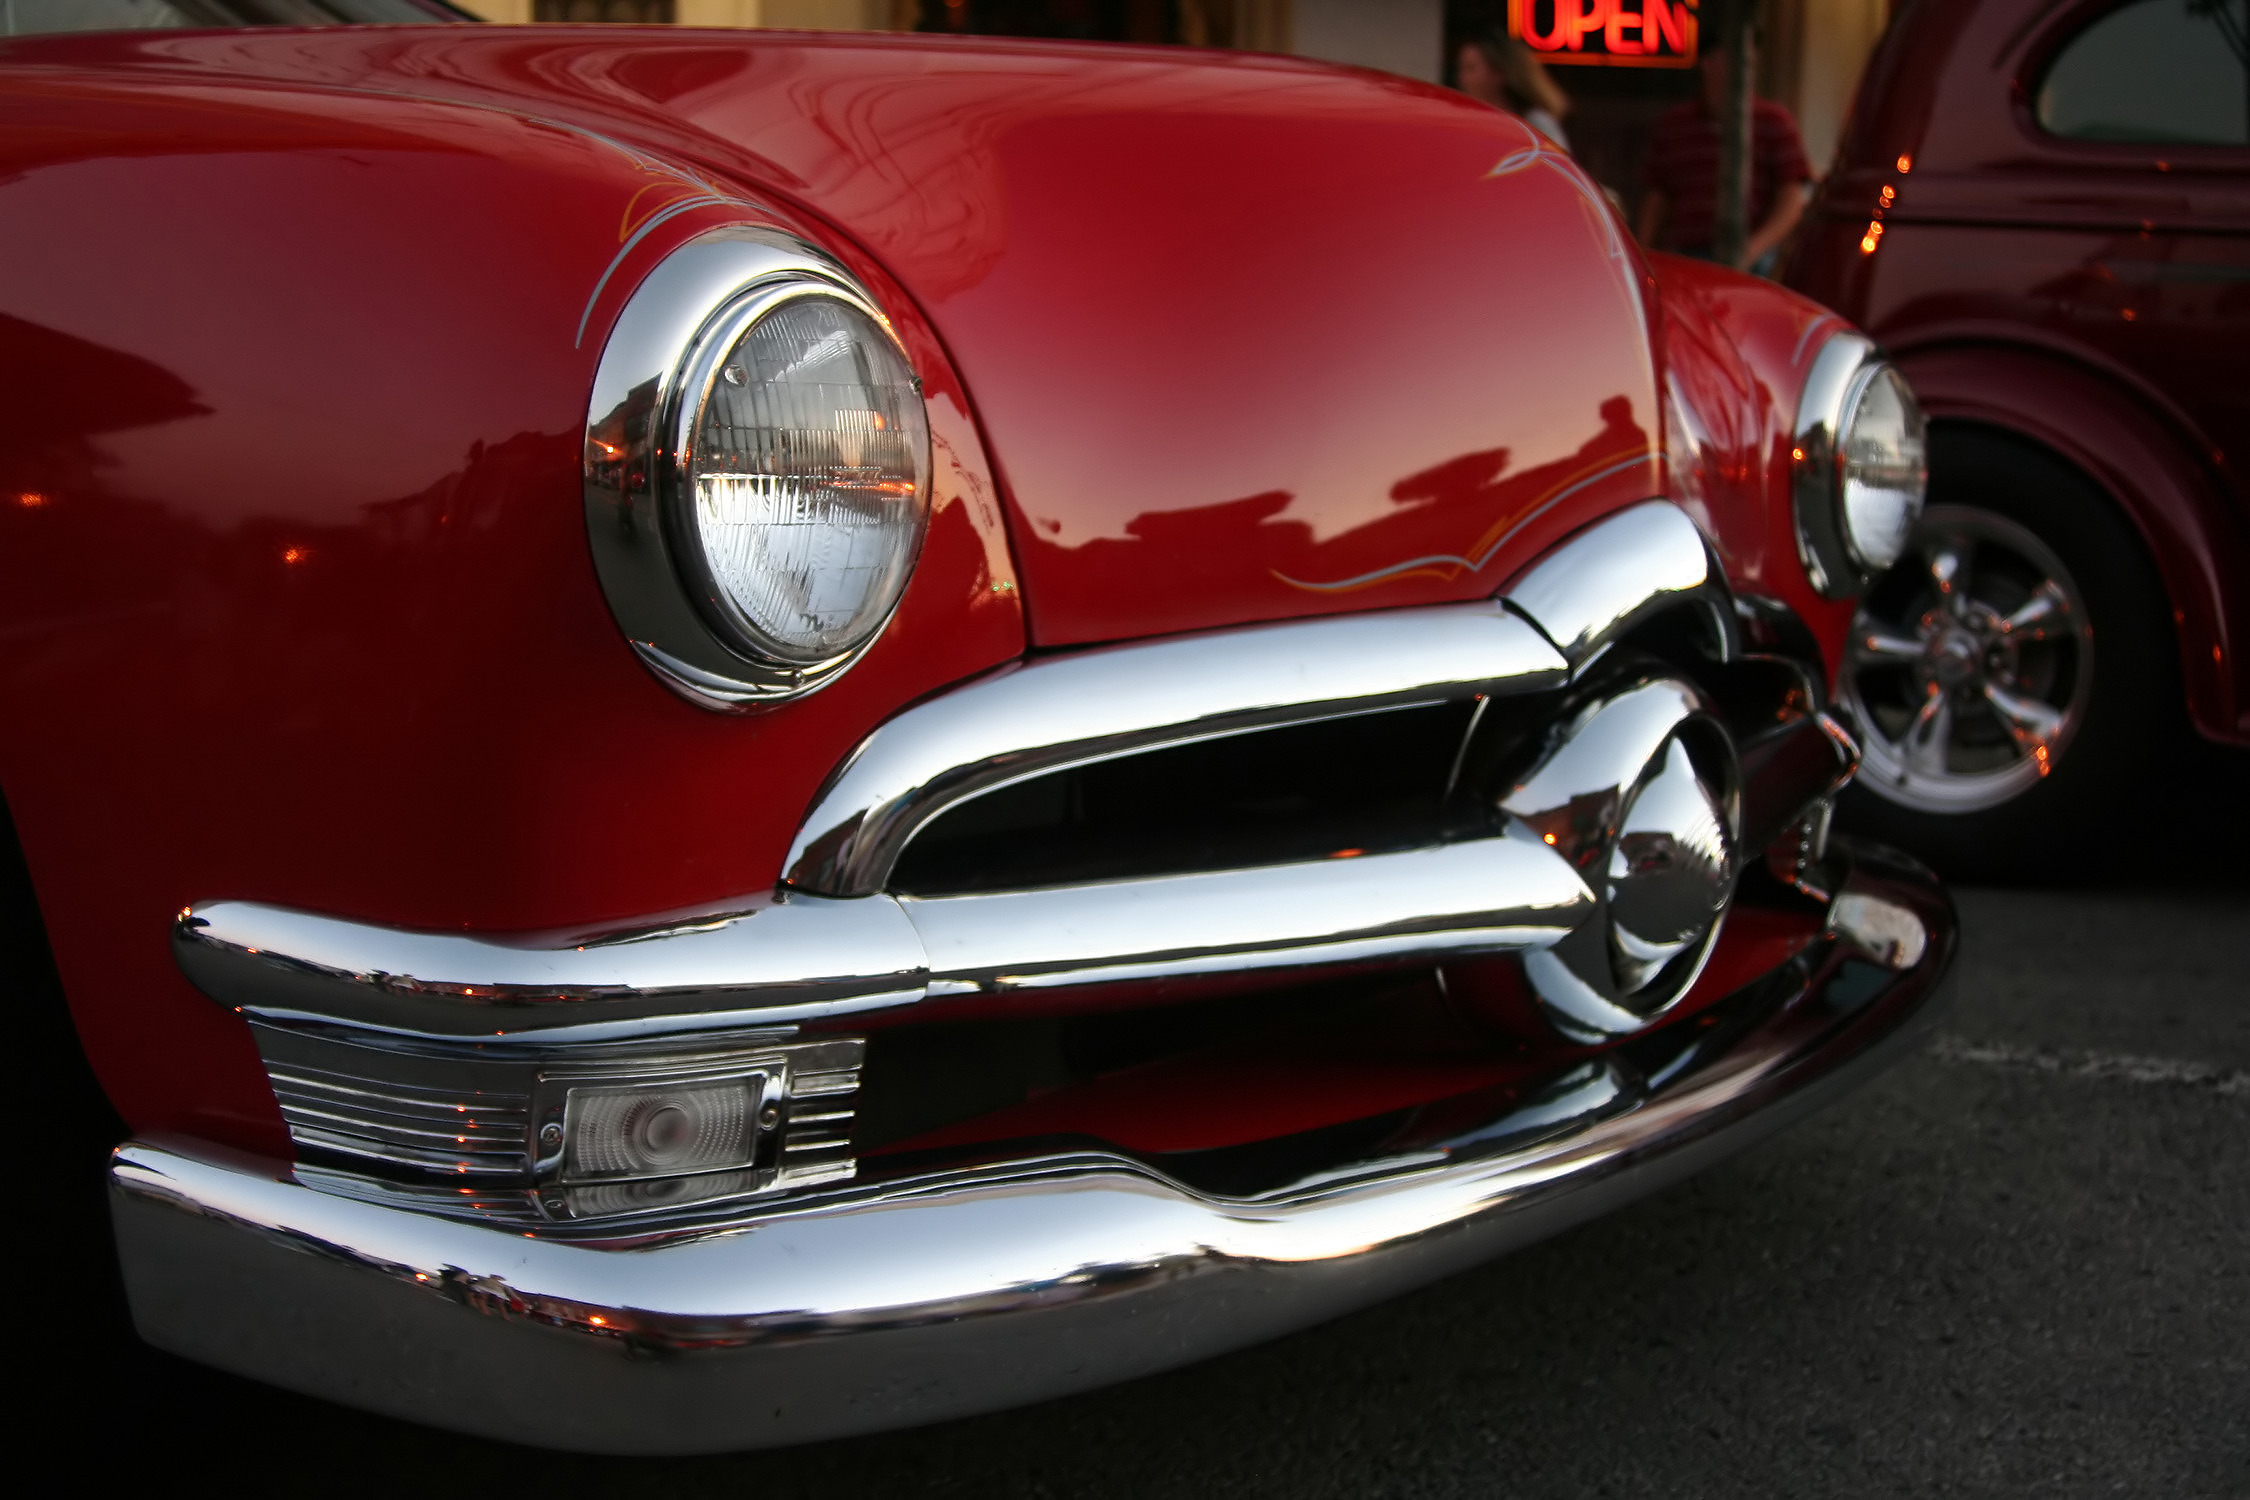 Amazing Old Car Values Free Contemporary - Classic Cars Ideas - boiq ...